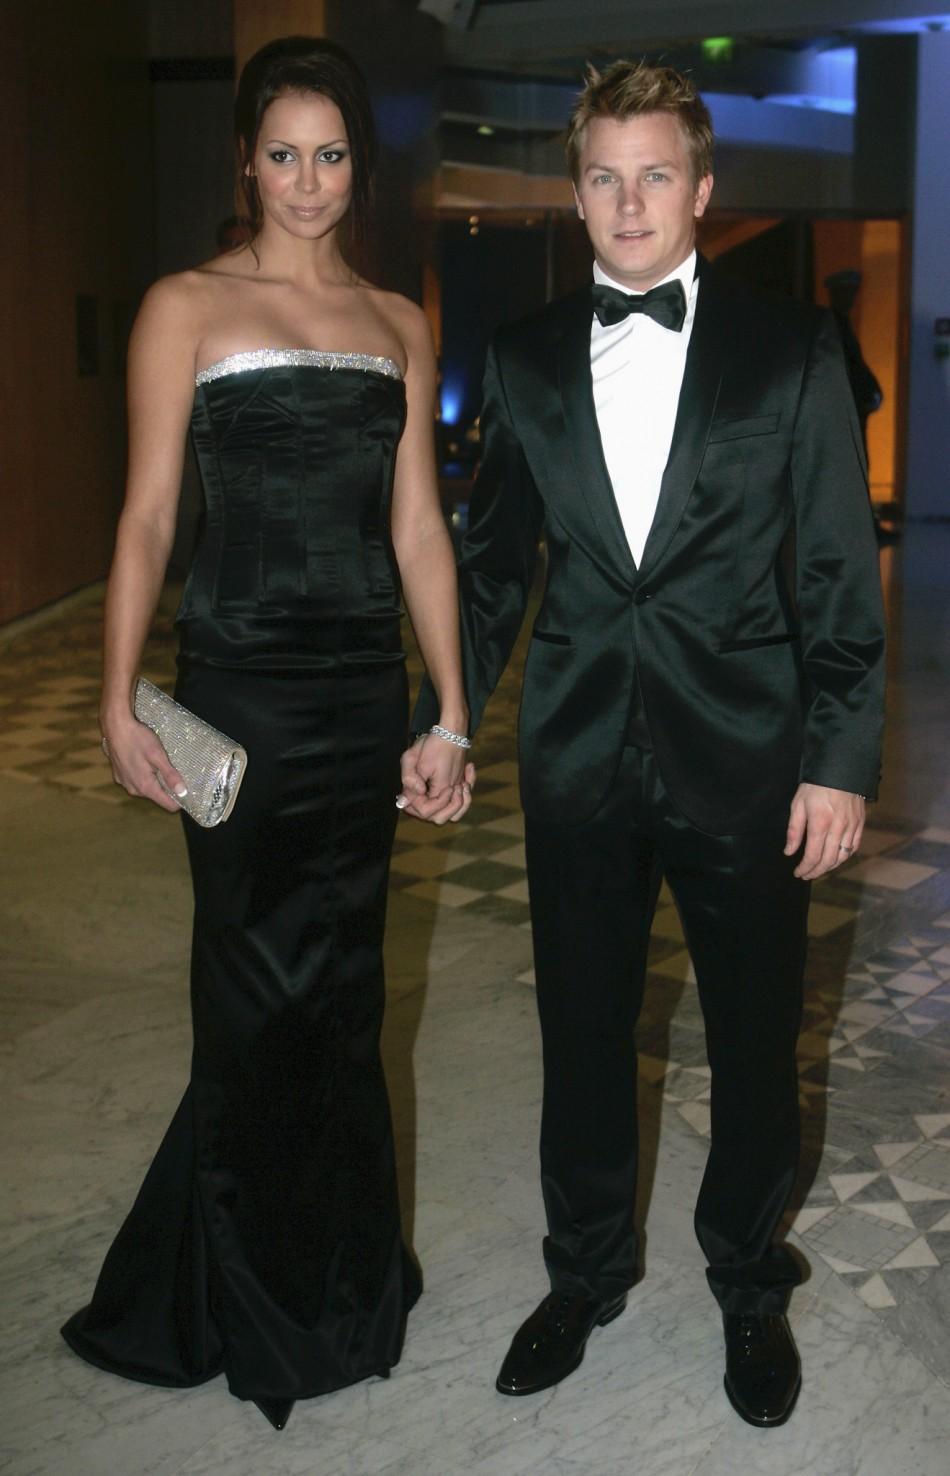 Formula One world champion Kimi Raikkonen and his wife Jenni Dahlman arrive at the 2007 FIA Prize Giving gala in Monaco